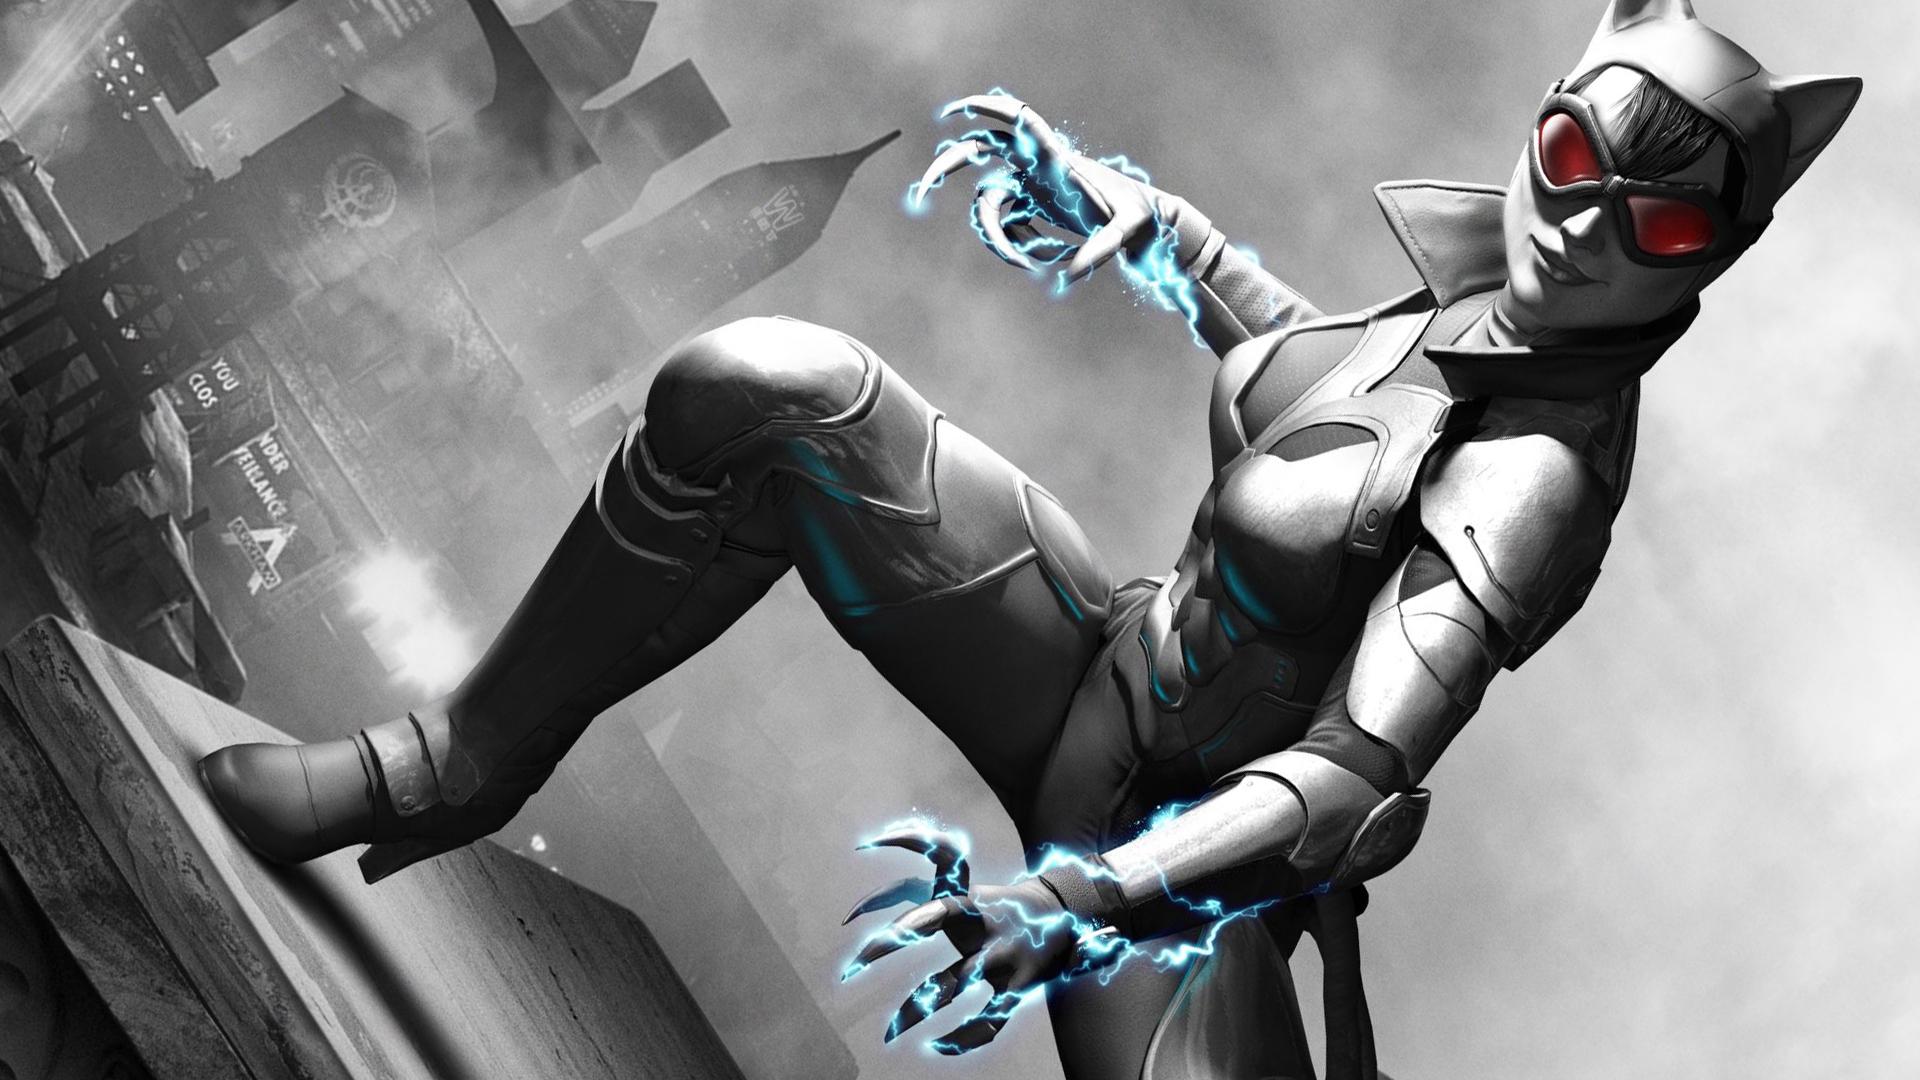 Batman Arkham City Wallpaper Arlequina: Batman: Arkham City Backgrounds, Pictures, Images